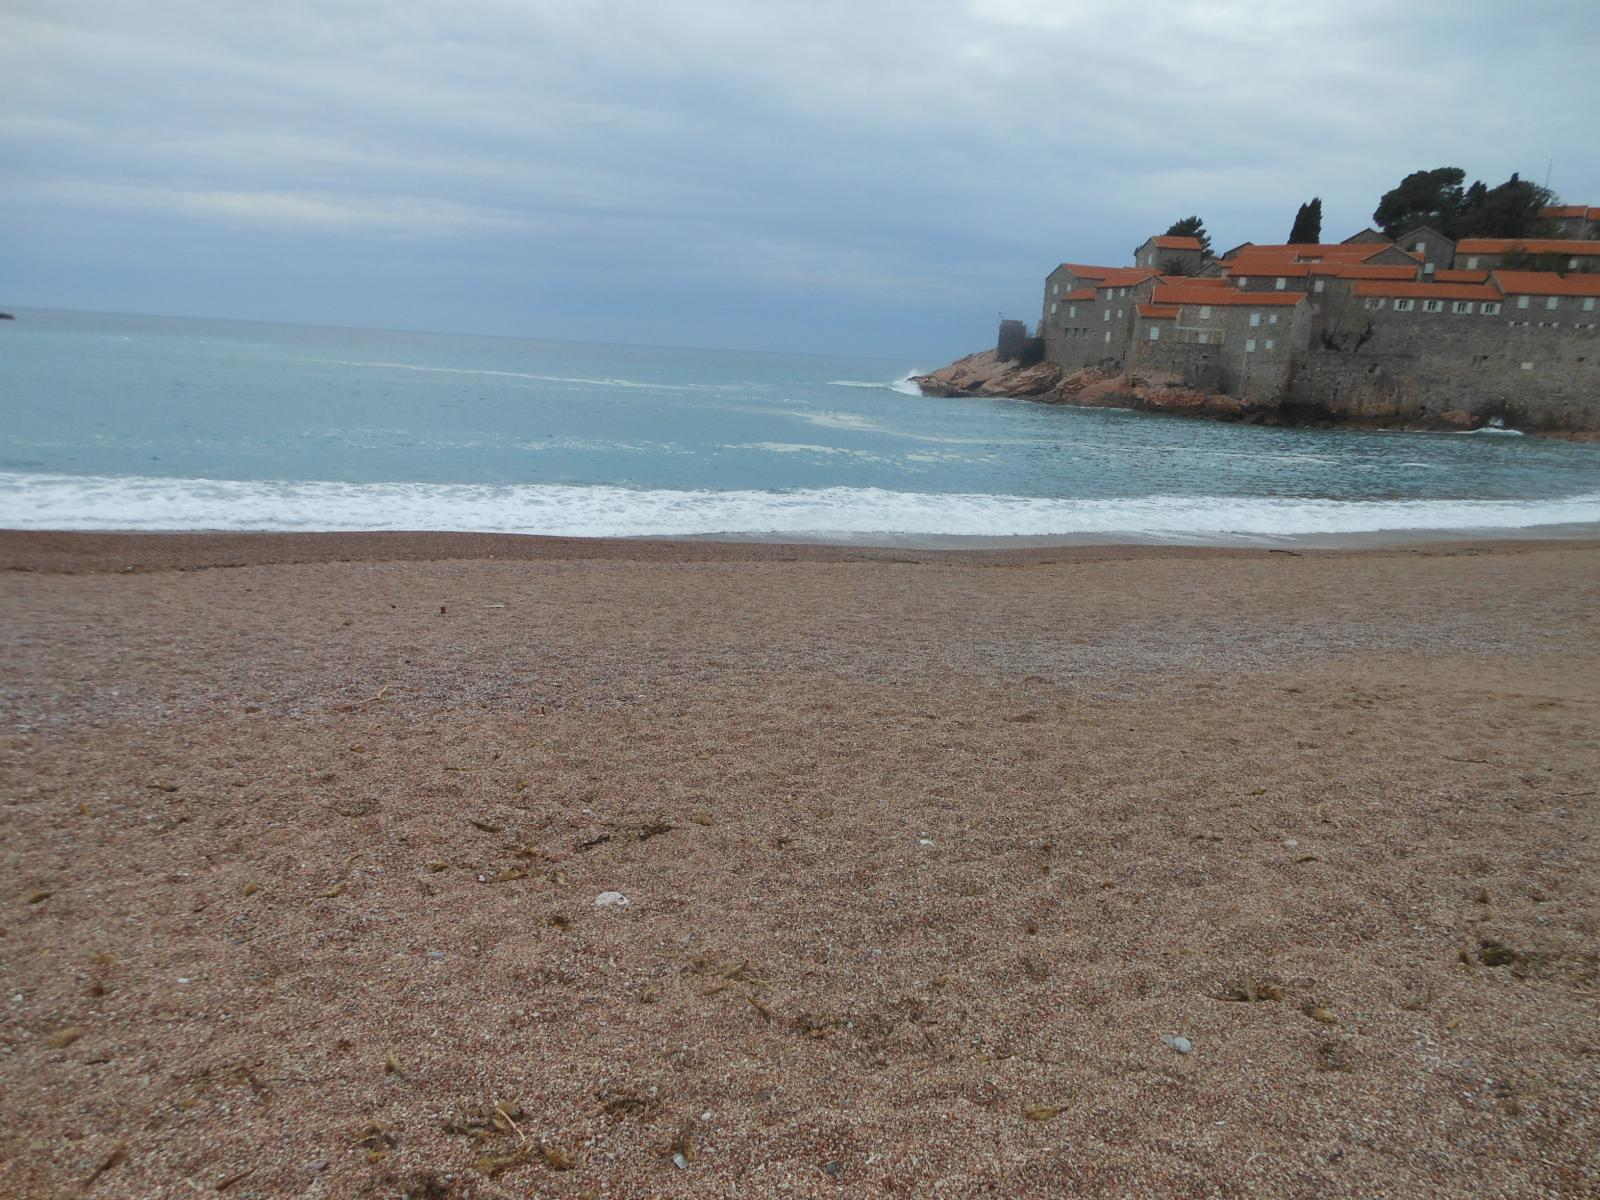 Пляж св. стефан фото